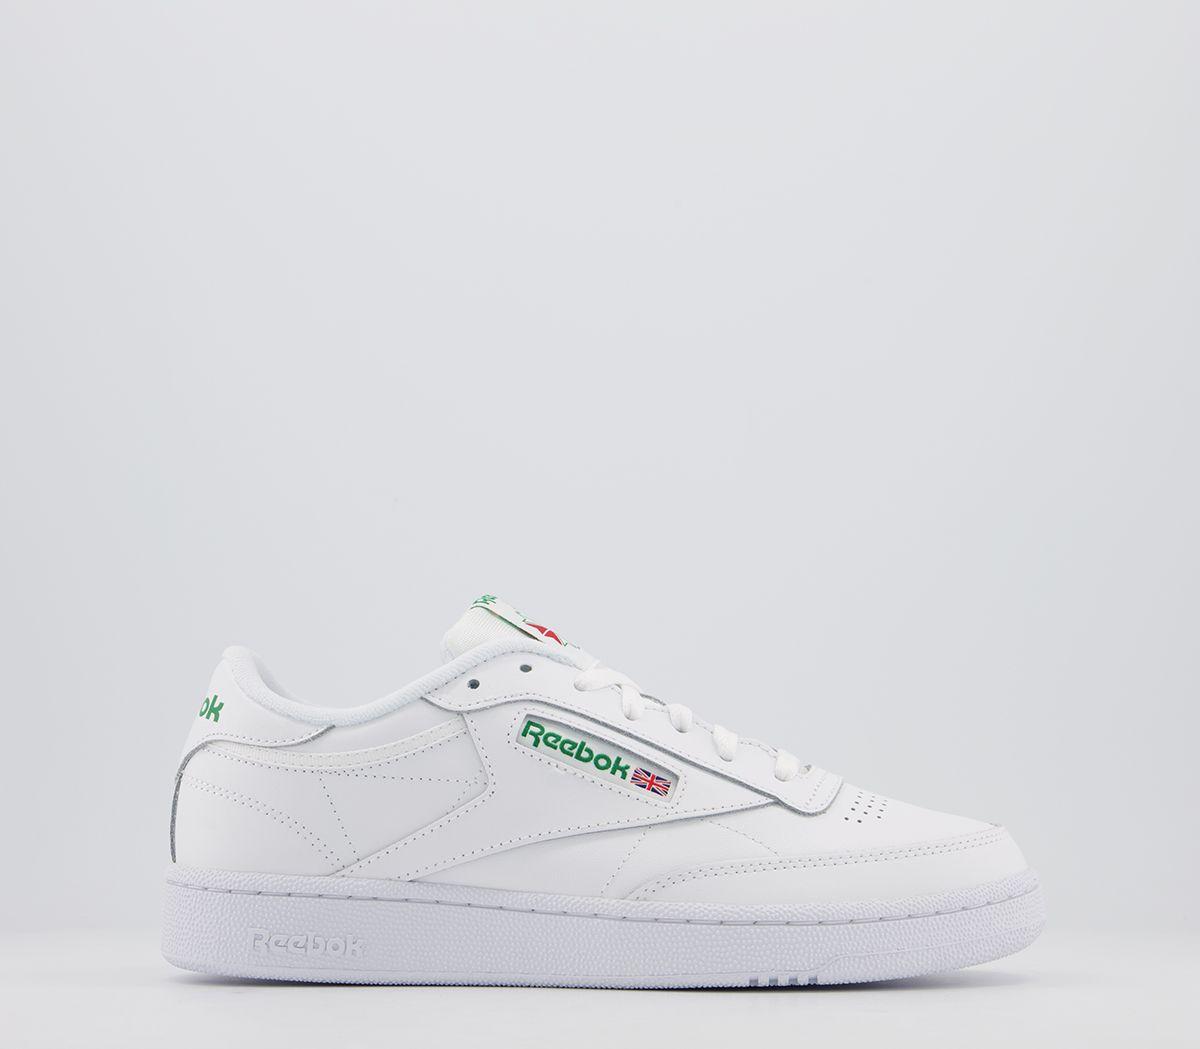 ae9218e9427 Reebok Club C 85 White Green - His trainers